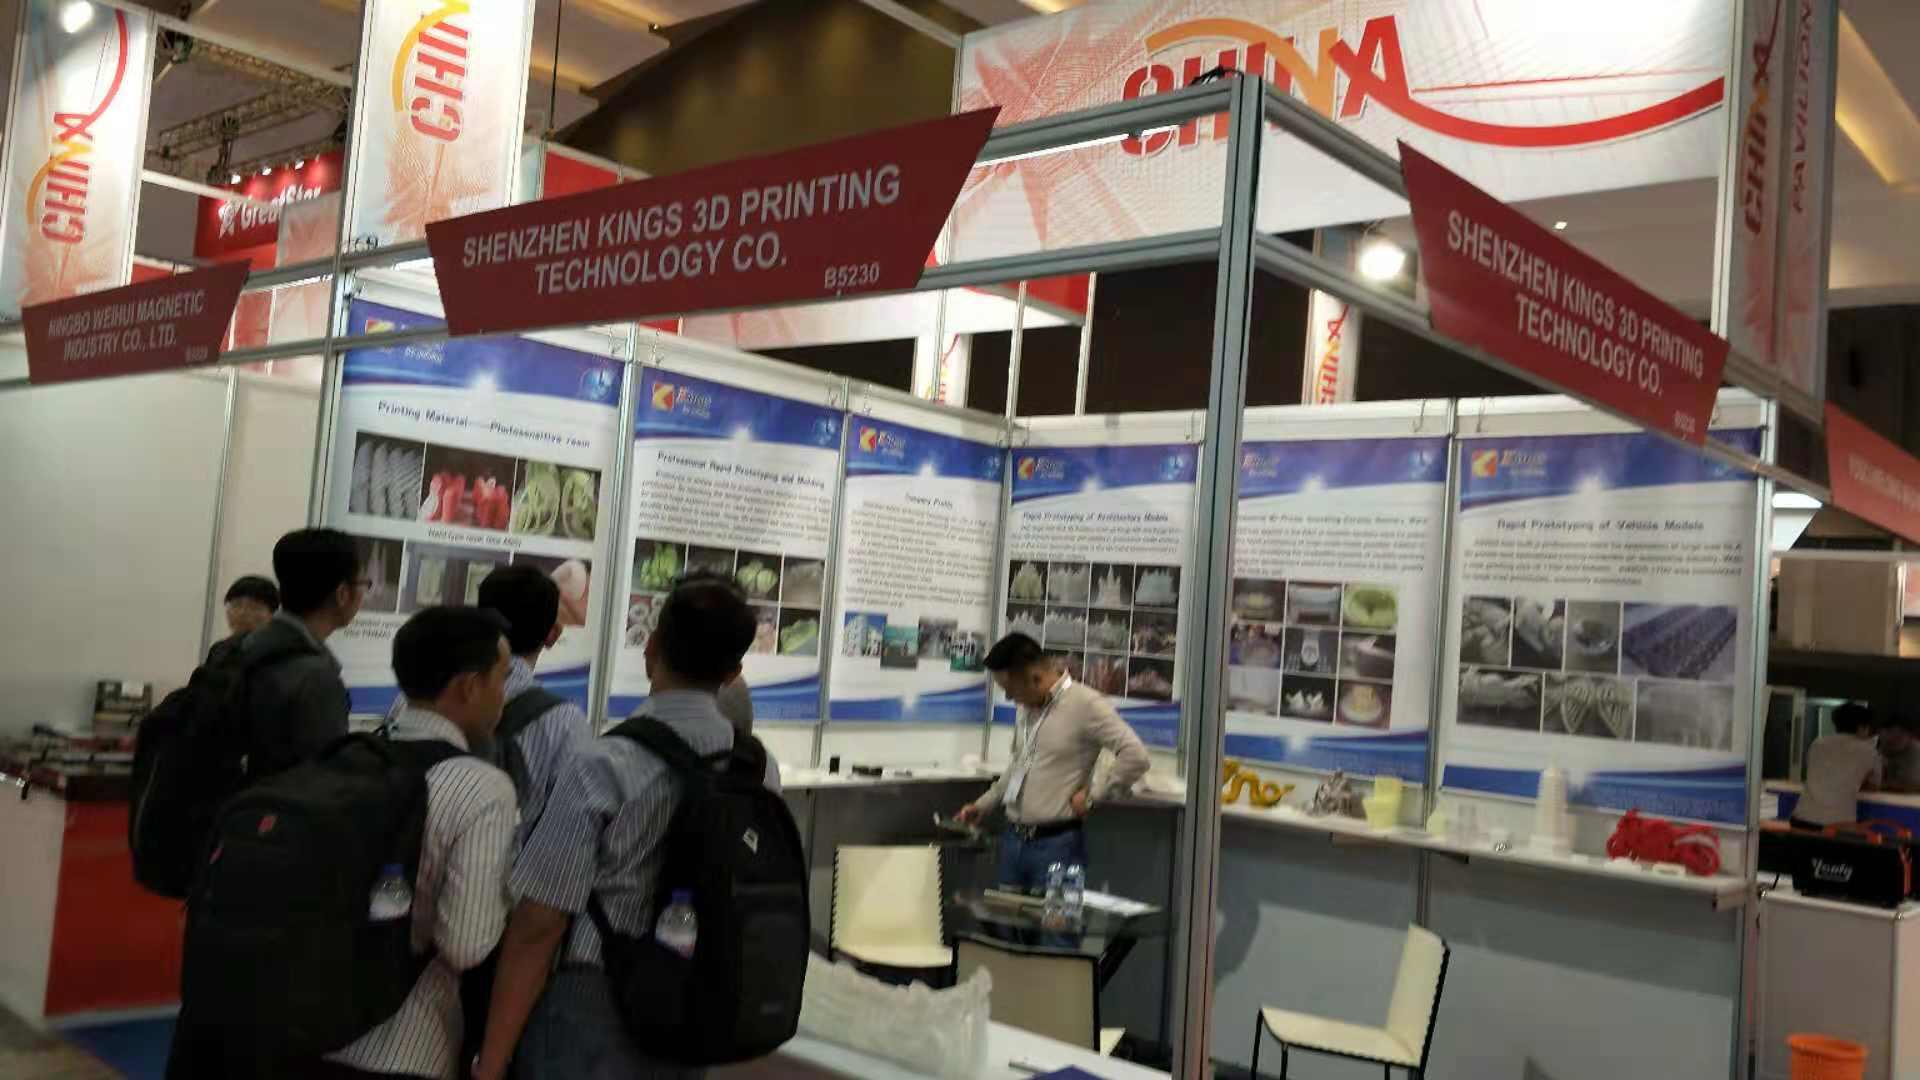 Kings工业级SLA3D打印机在印尼制造展赢得有效反馈